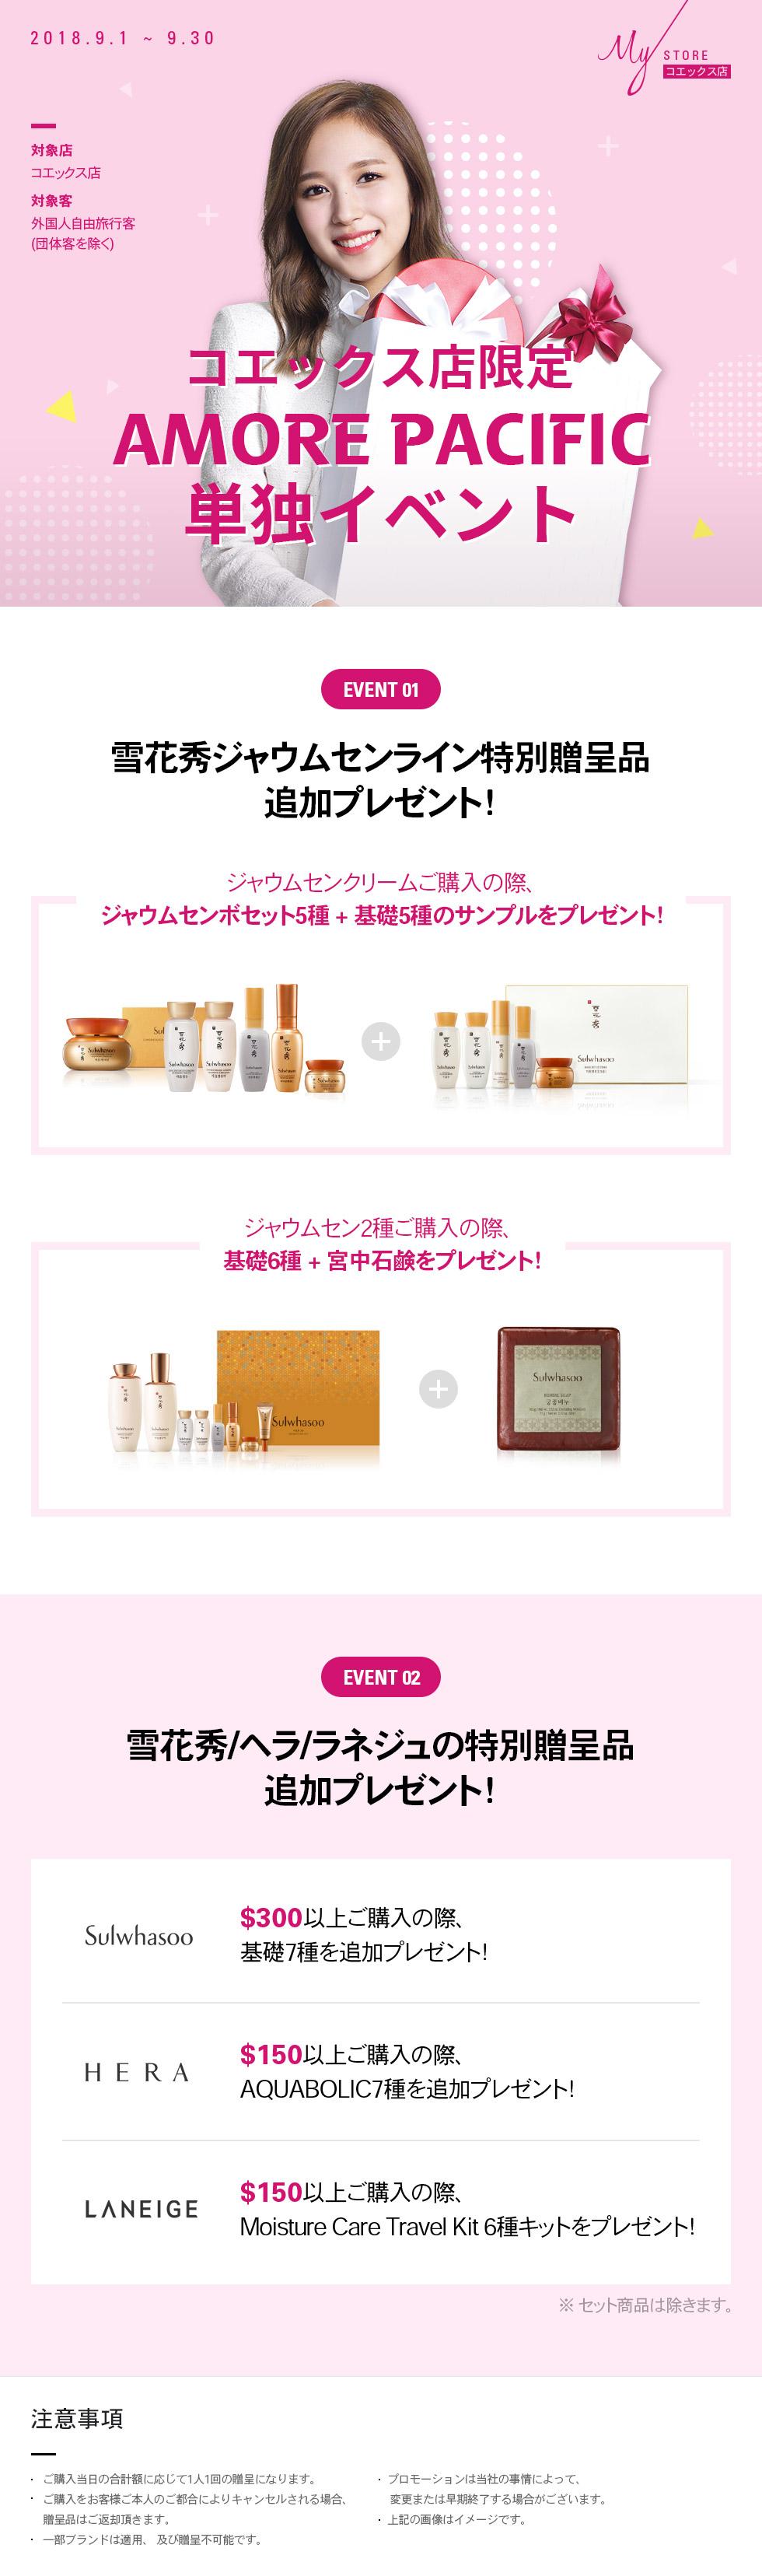 COEX店限定 AMORE PACIFIC単独イベント